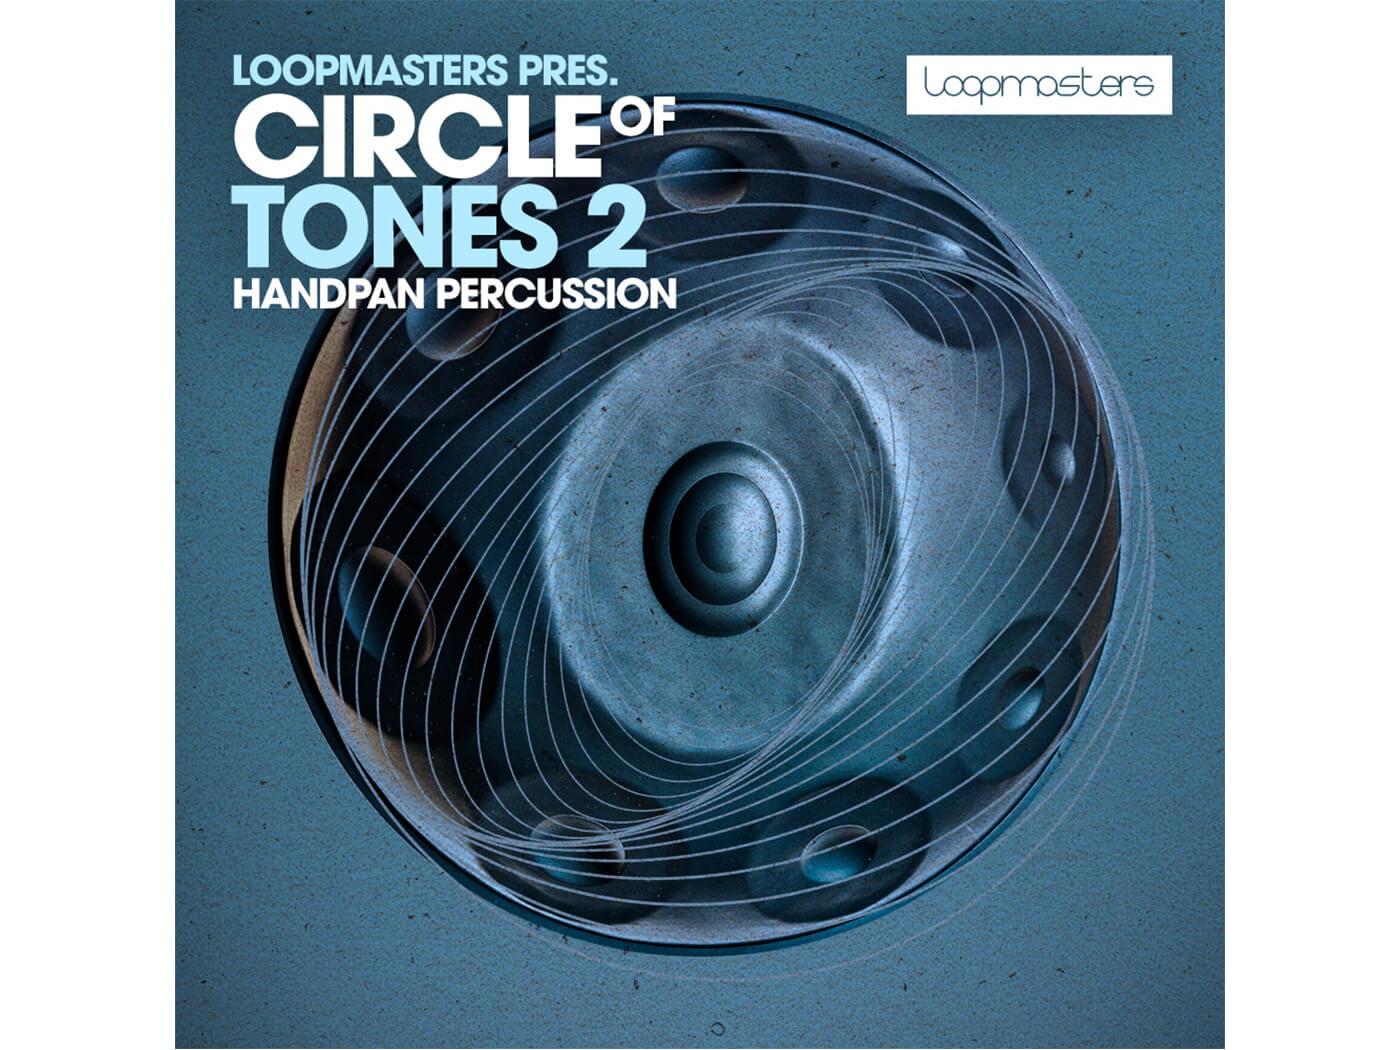 Loopmasters - Circle of Tones 2